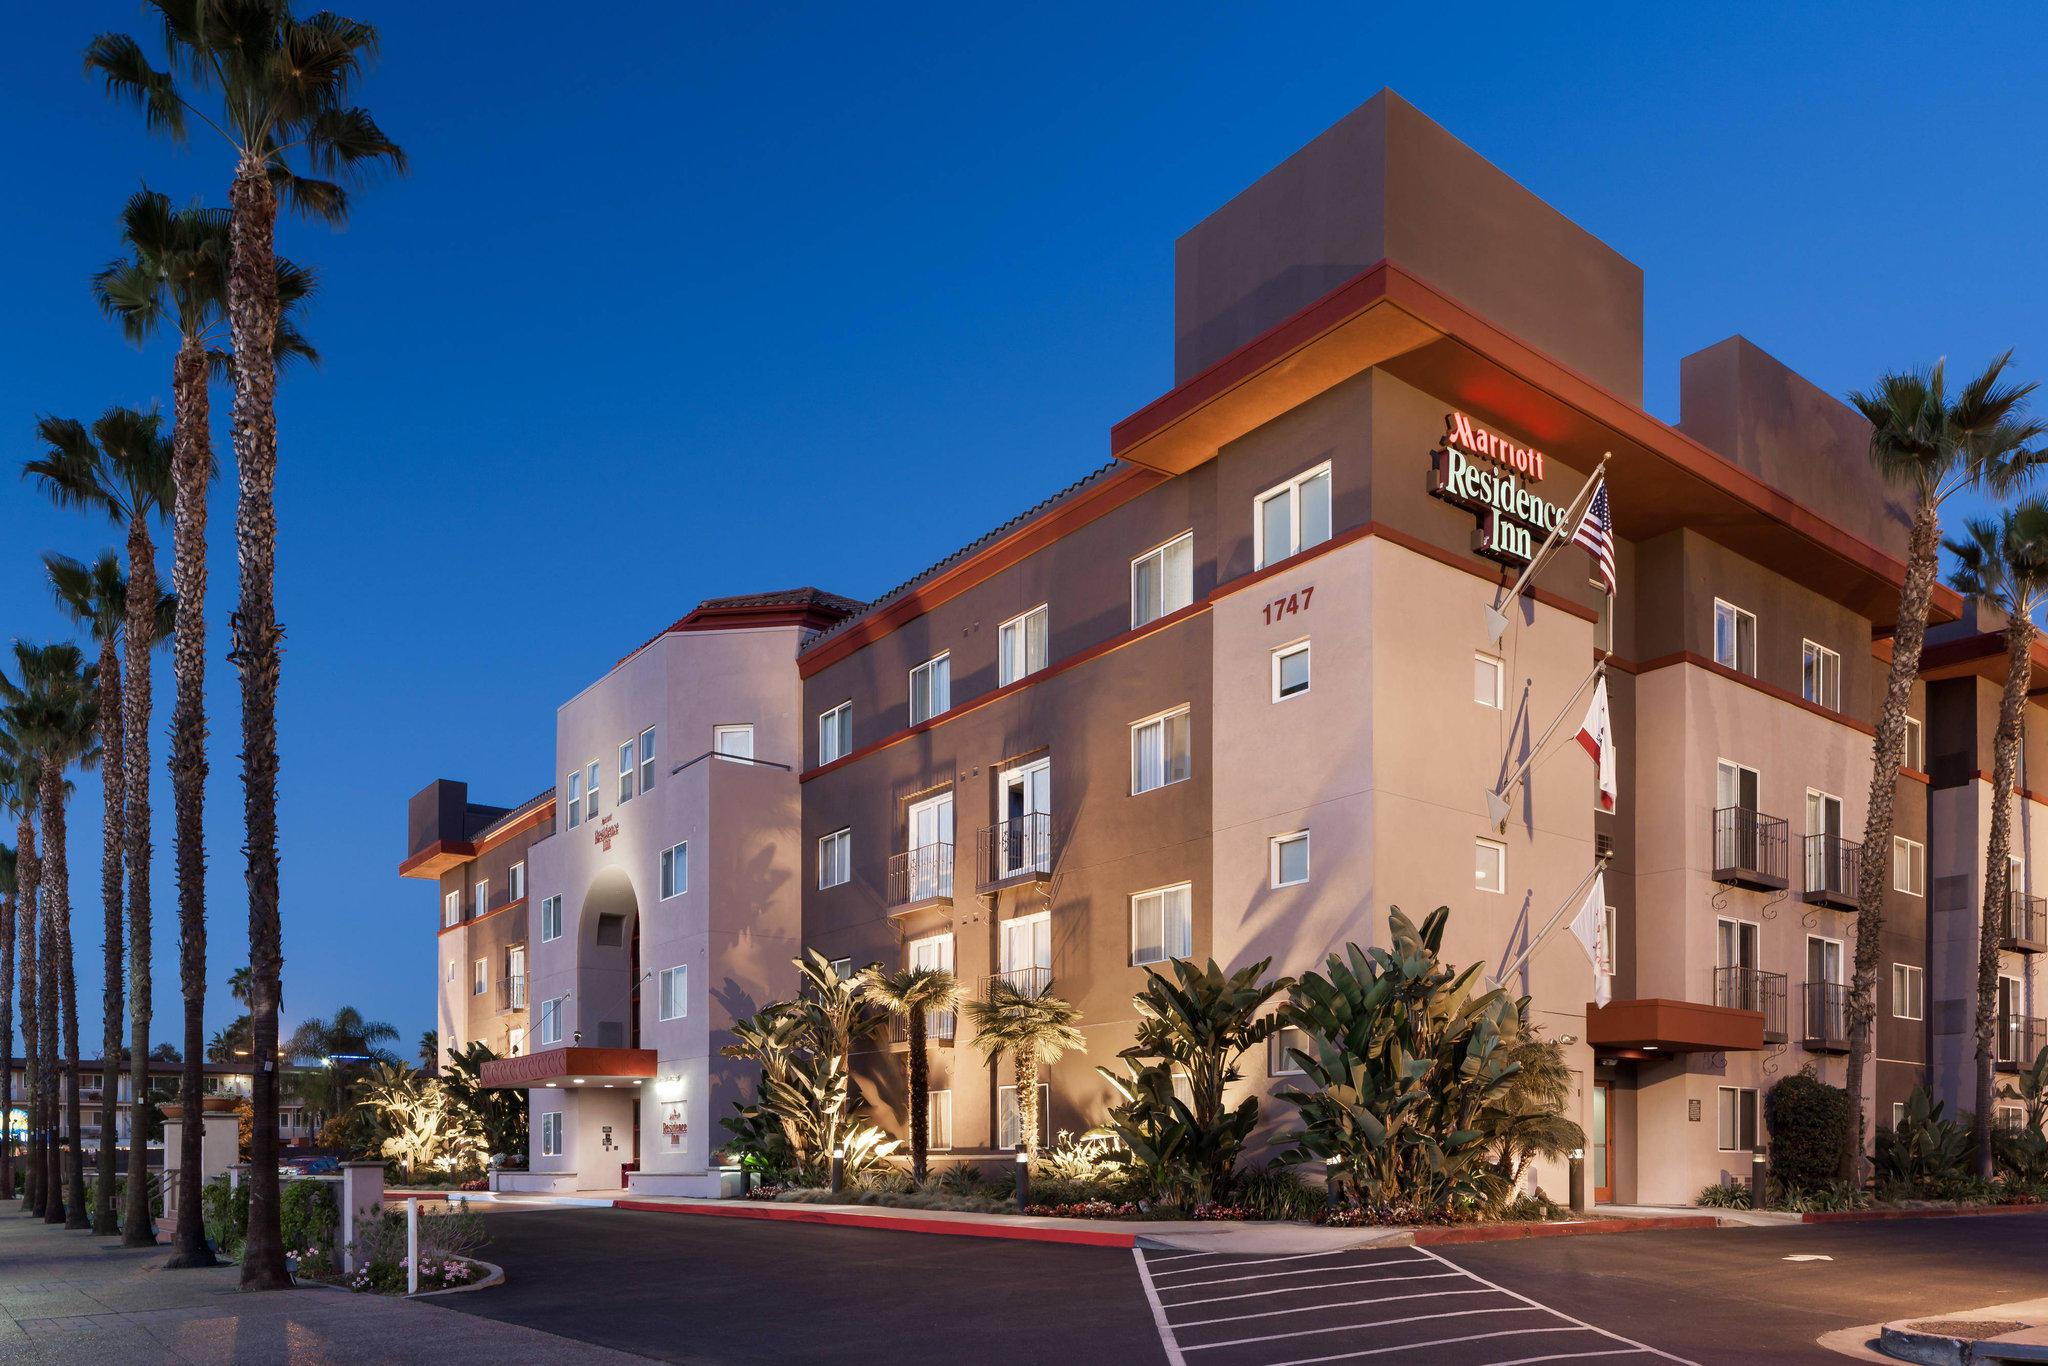 Residence Inn by Marriott San Diego Downtown in San Diego, CA, photo #3